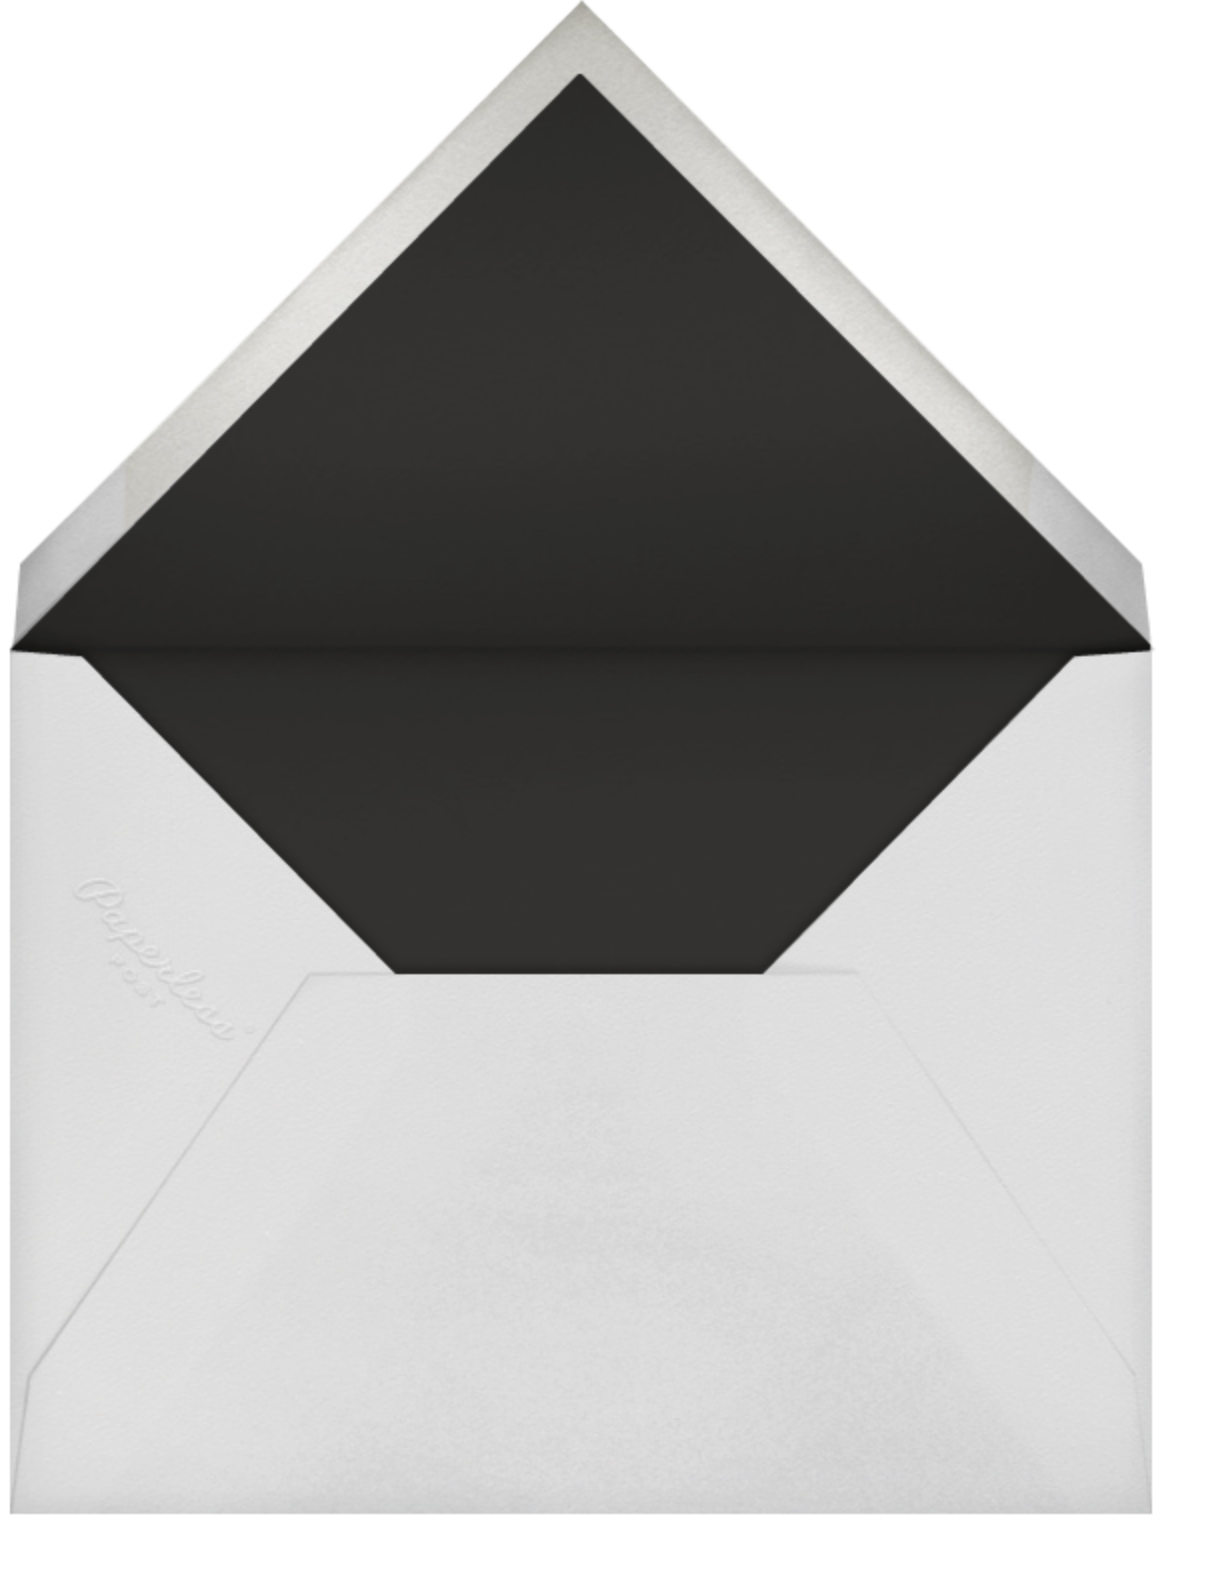 Gardenia (Save the Date) - White/Gold - Oscar de la Renta - Save the date - envelope back